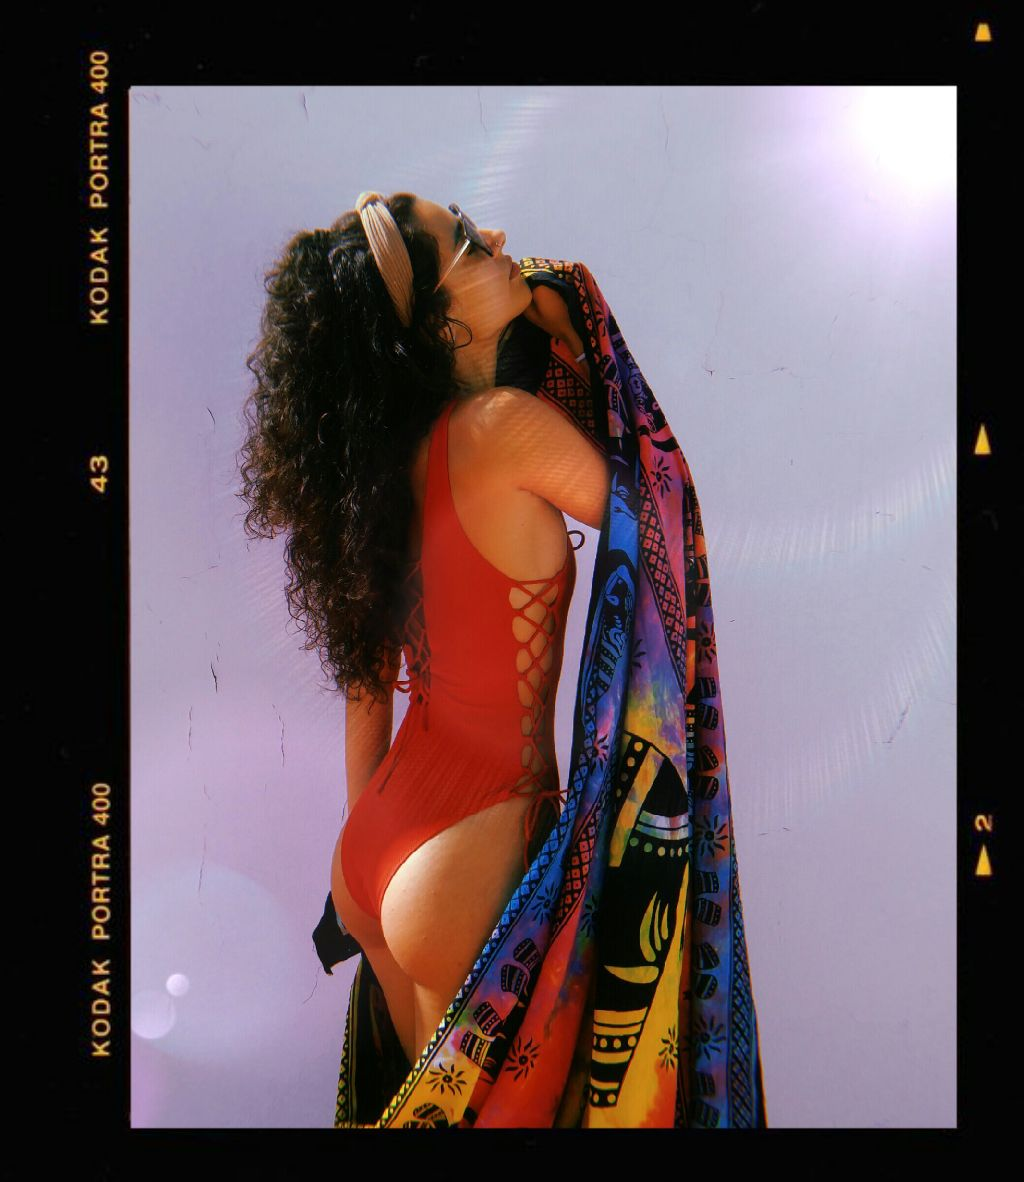 Sunlight ✨   #freetoedit #girl#curls #tumblr #tumblrgirl #curlyhair #swimwear #kodak #retro #remixit